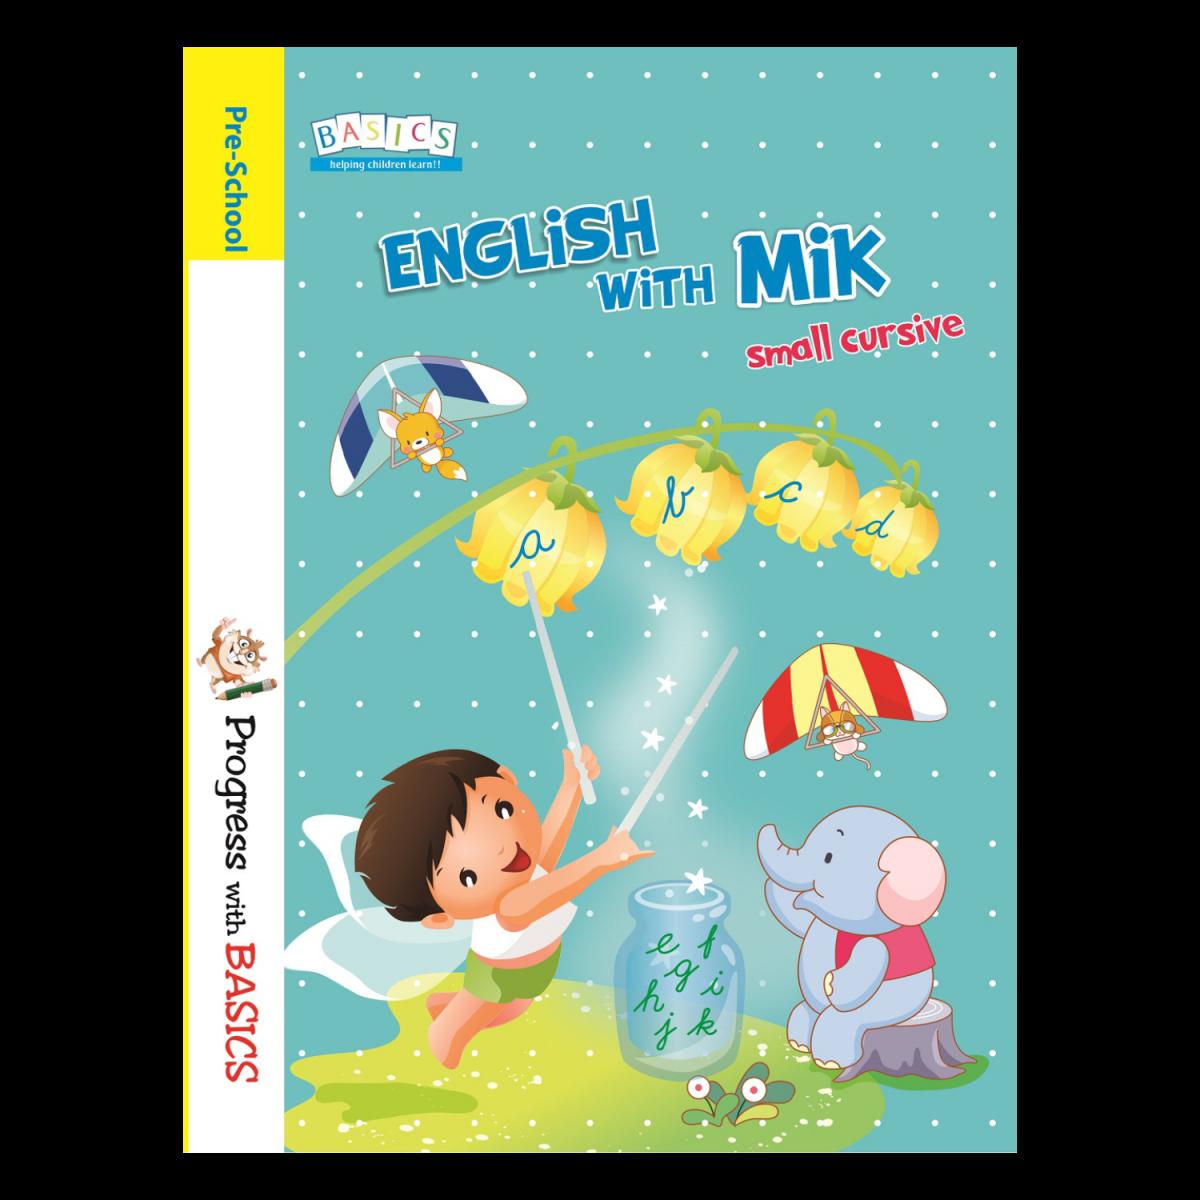 Basics English with mik Cursive Writing